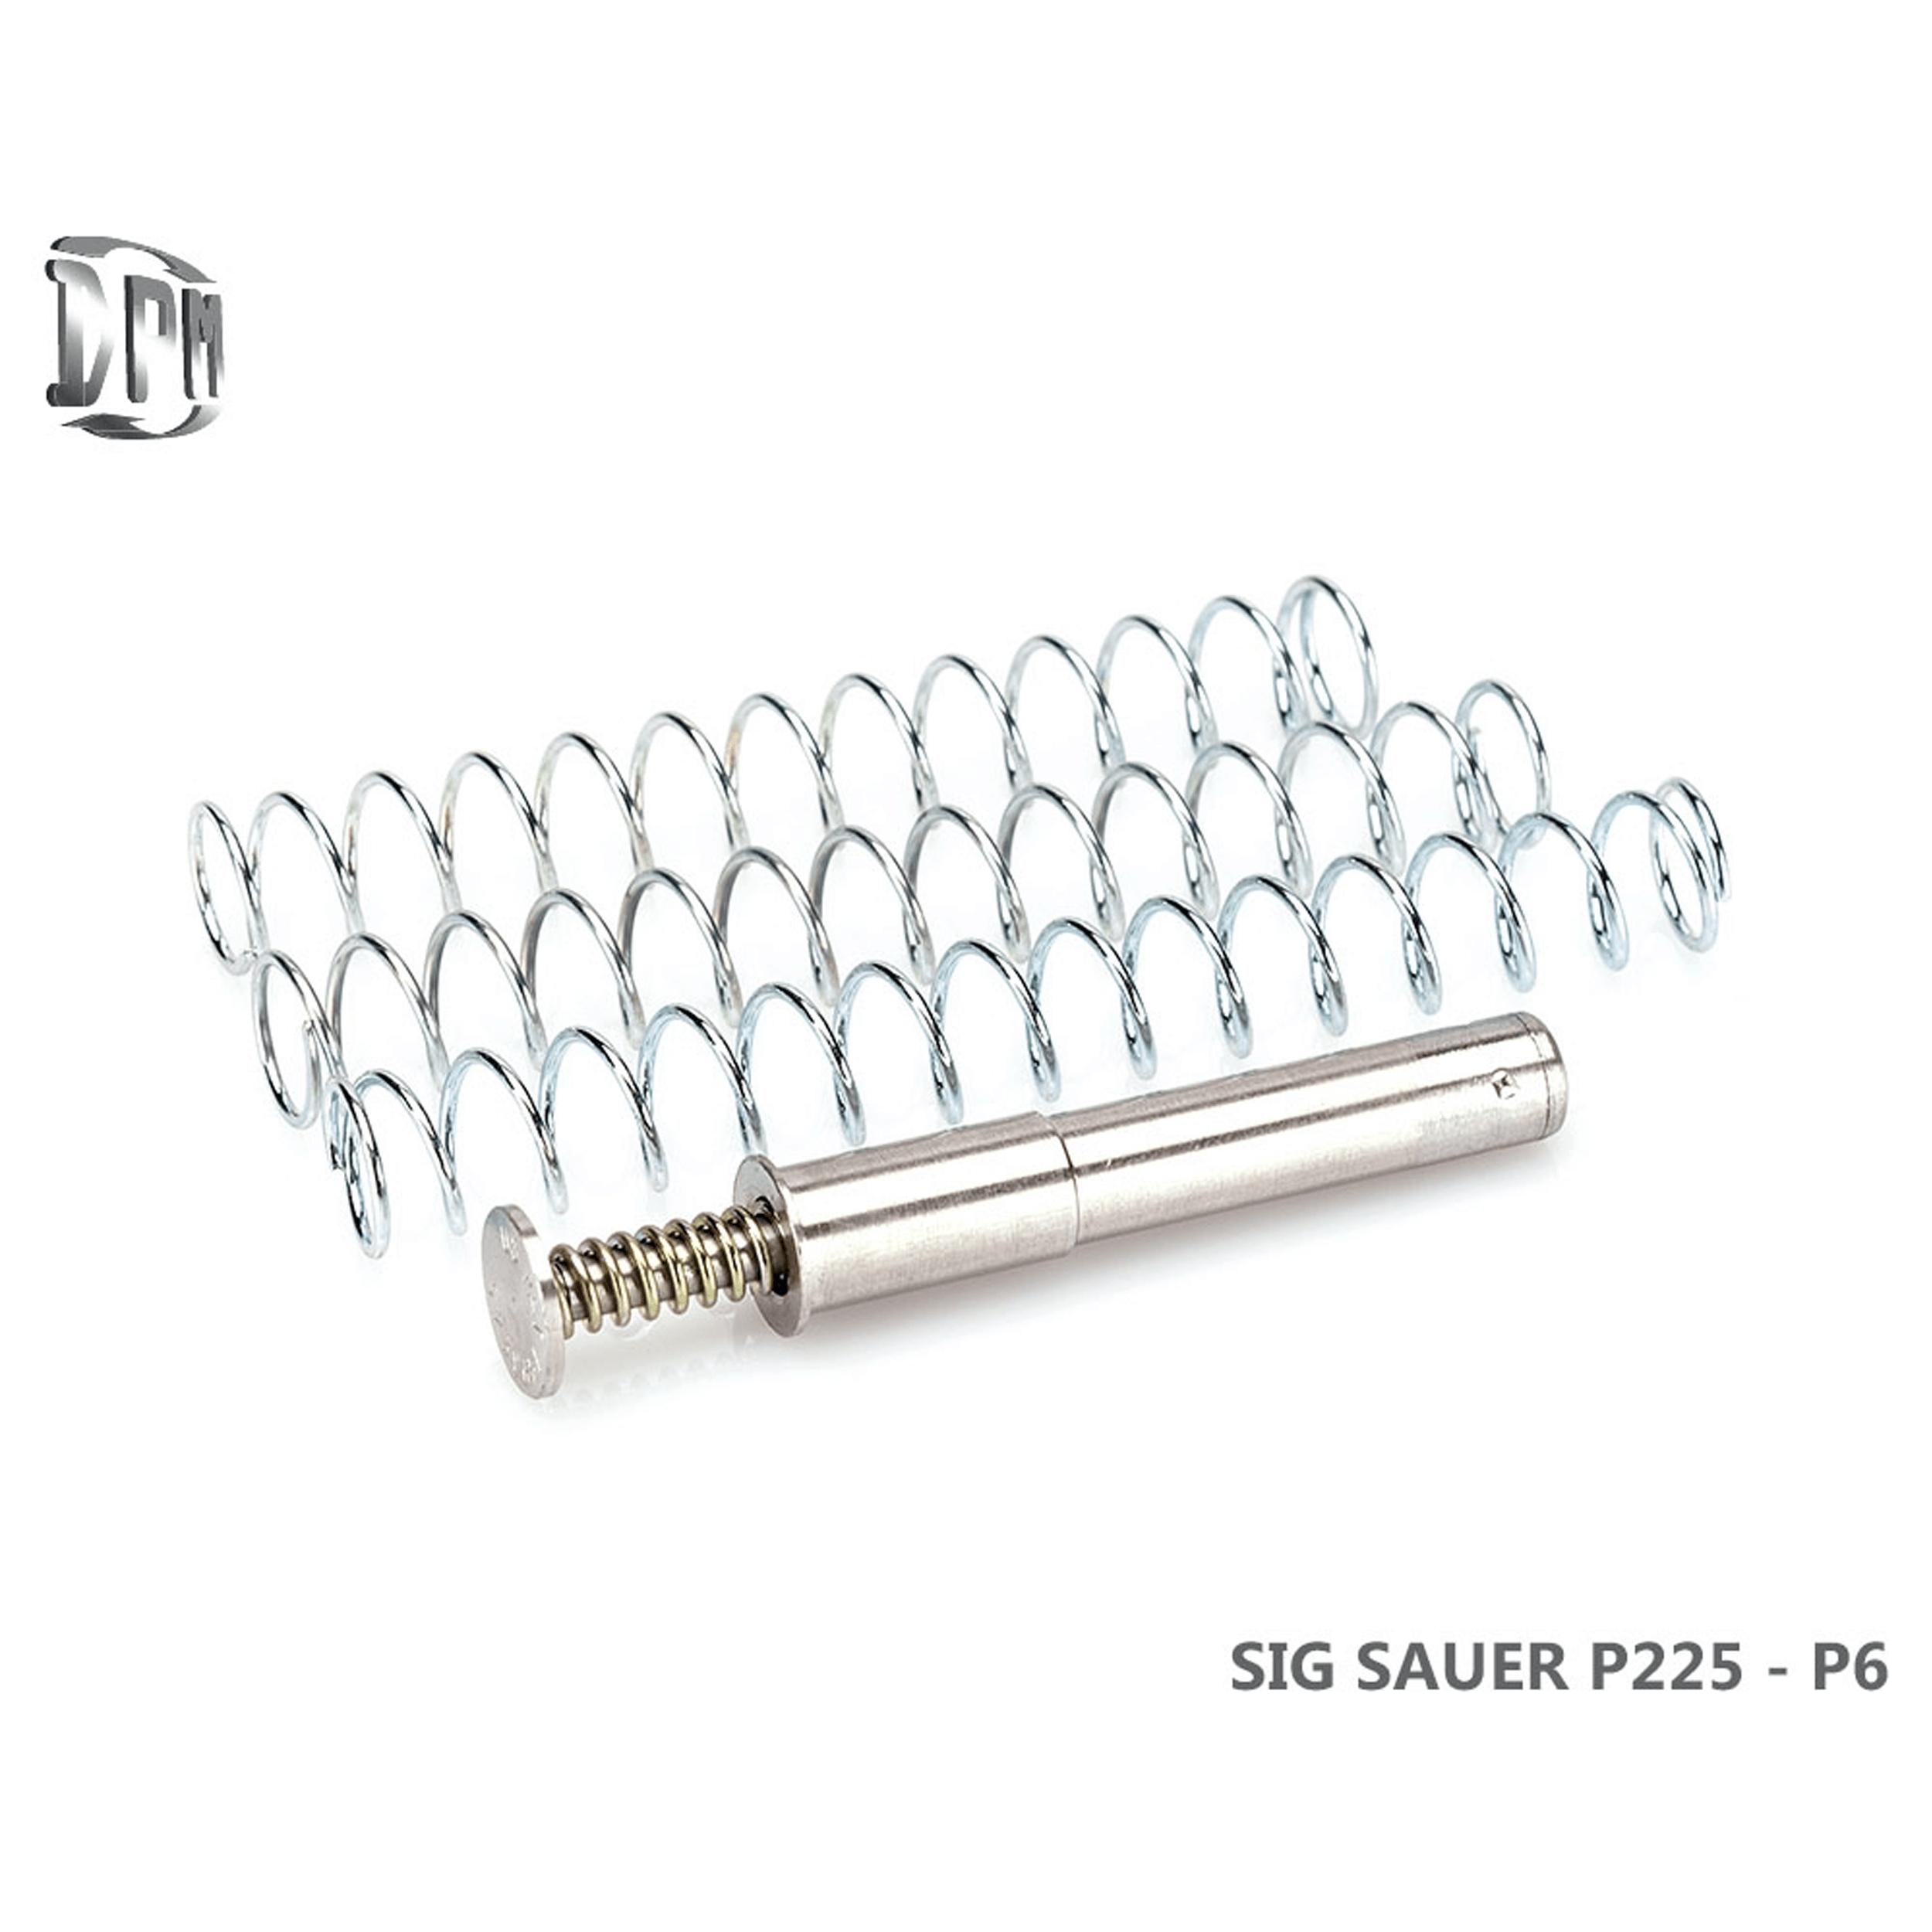 Sig Sauer P225 / P6 - 9MM